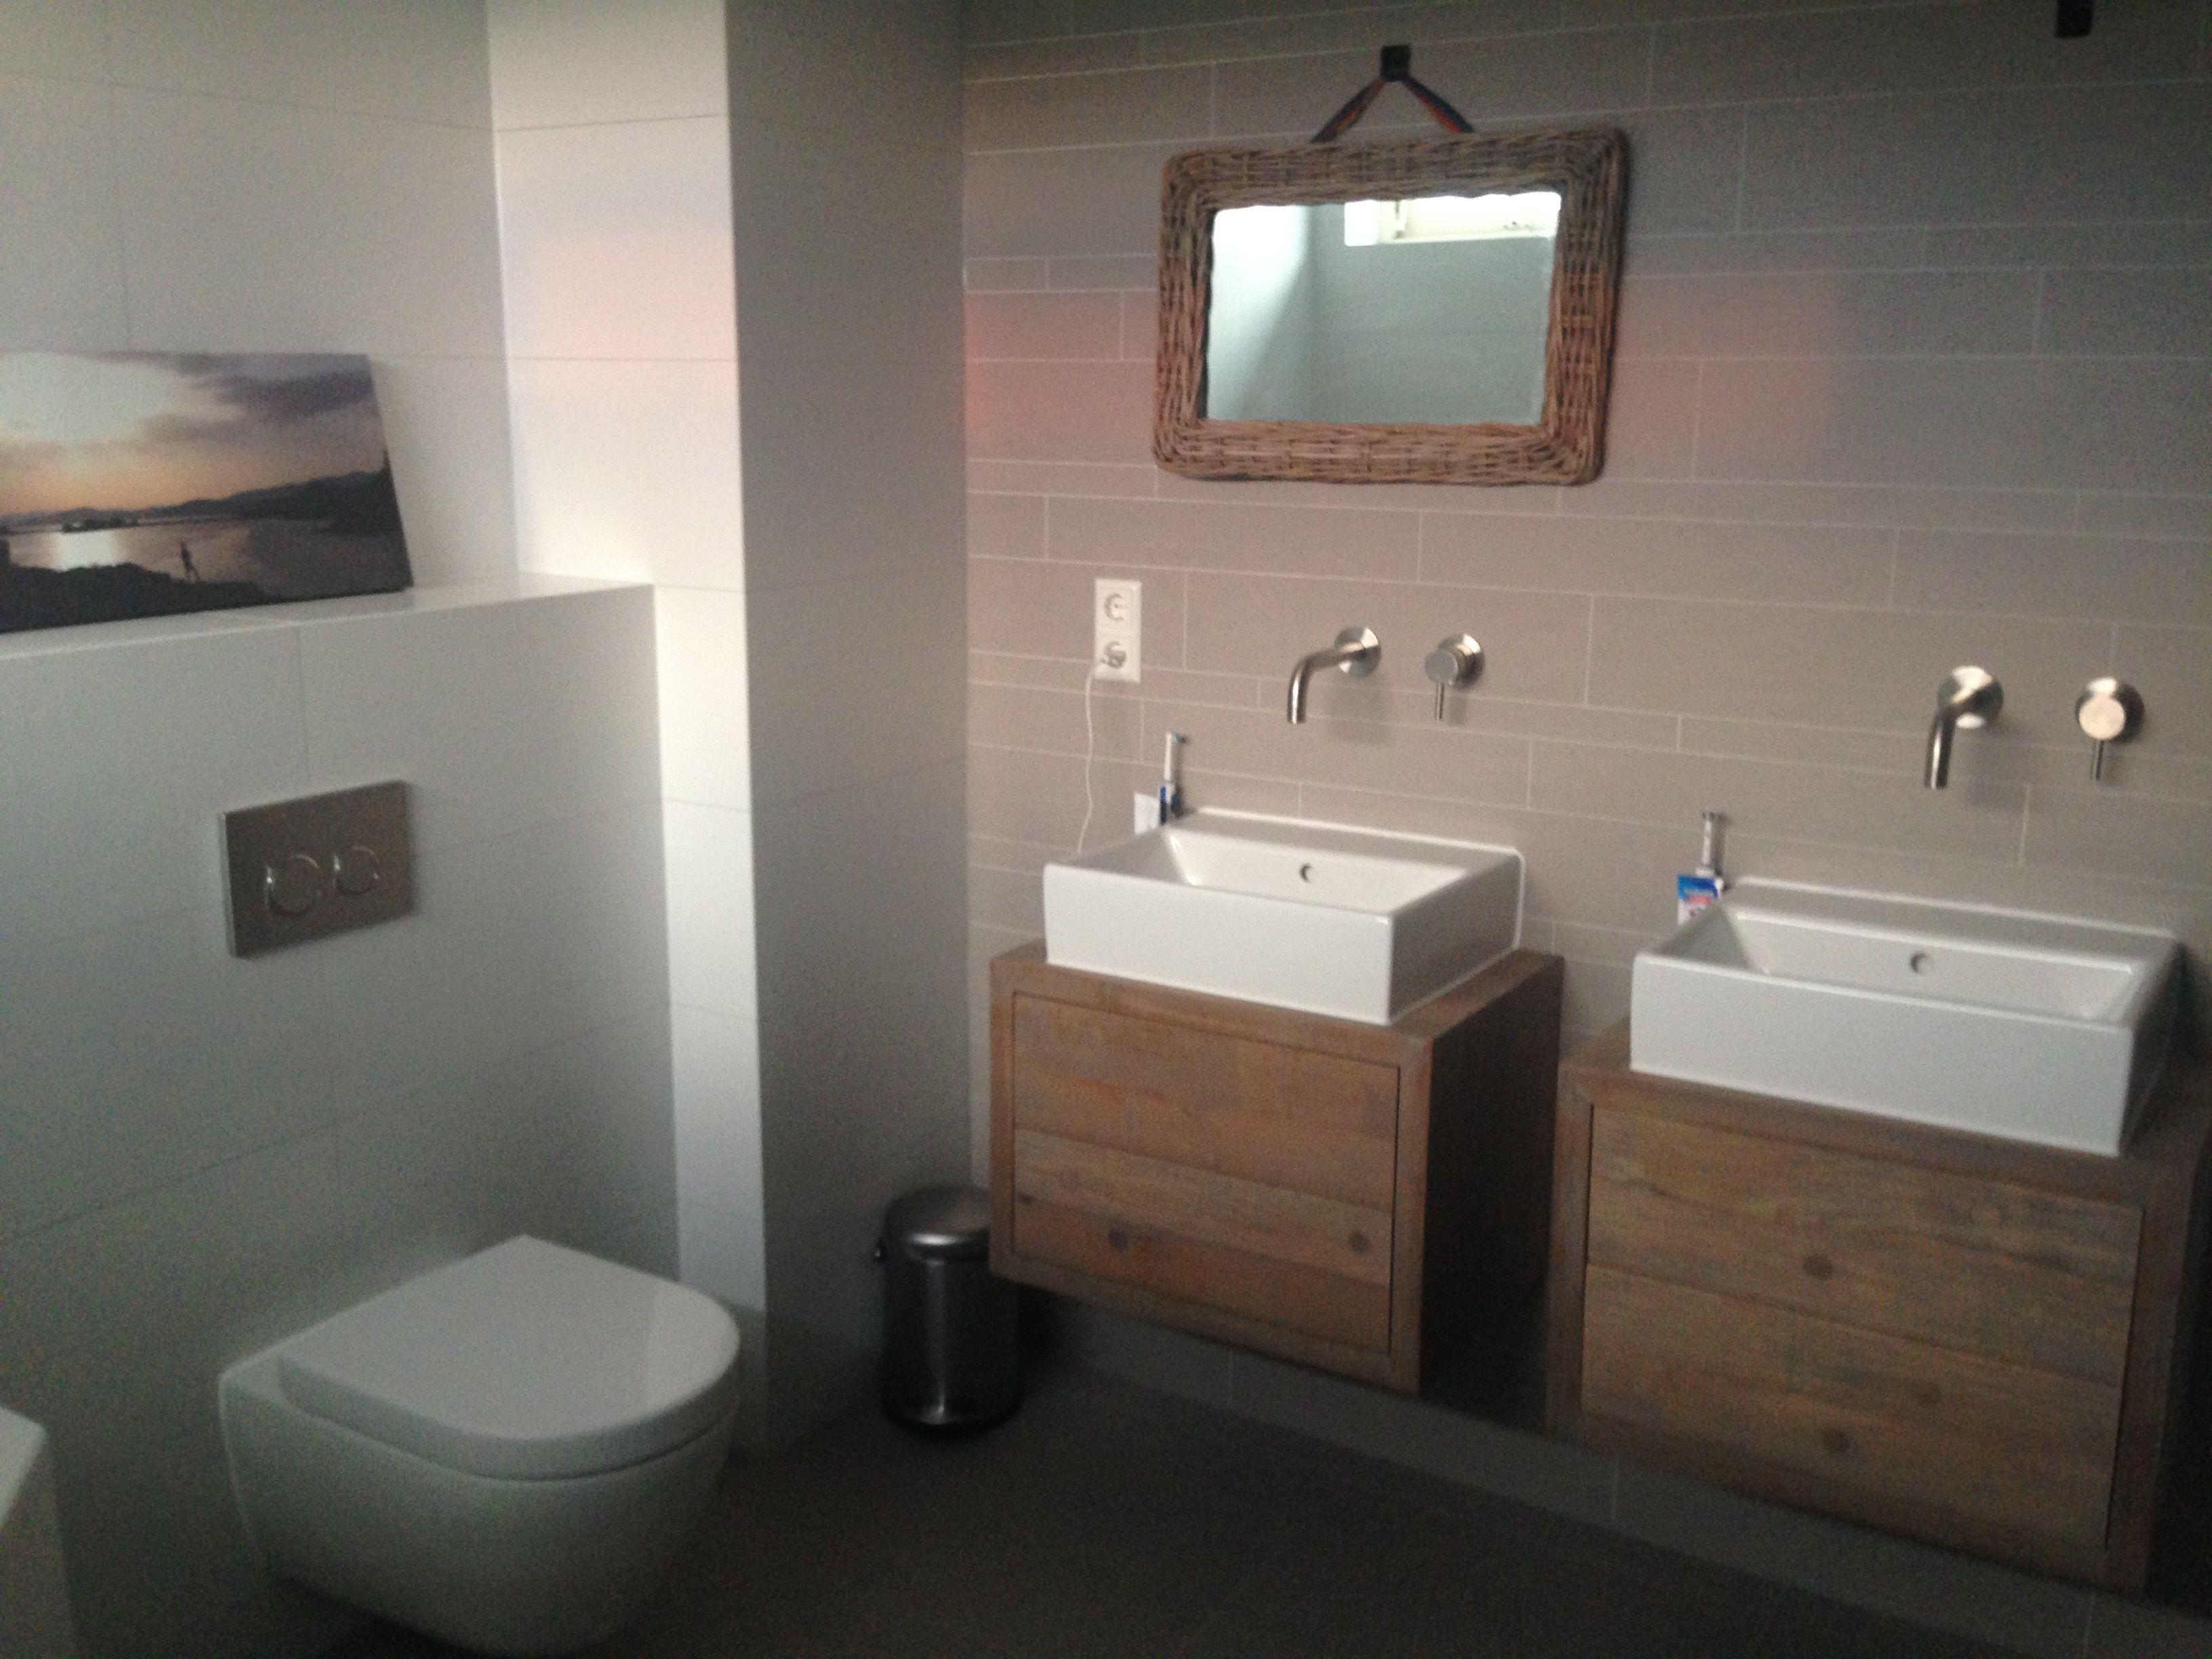 rak gpd 59 tegelstroken badkamer | Maes y dderwen | Pinterest